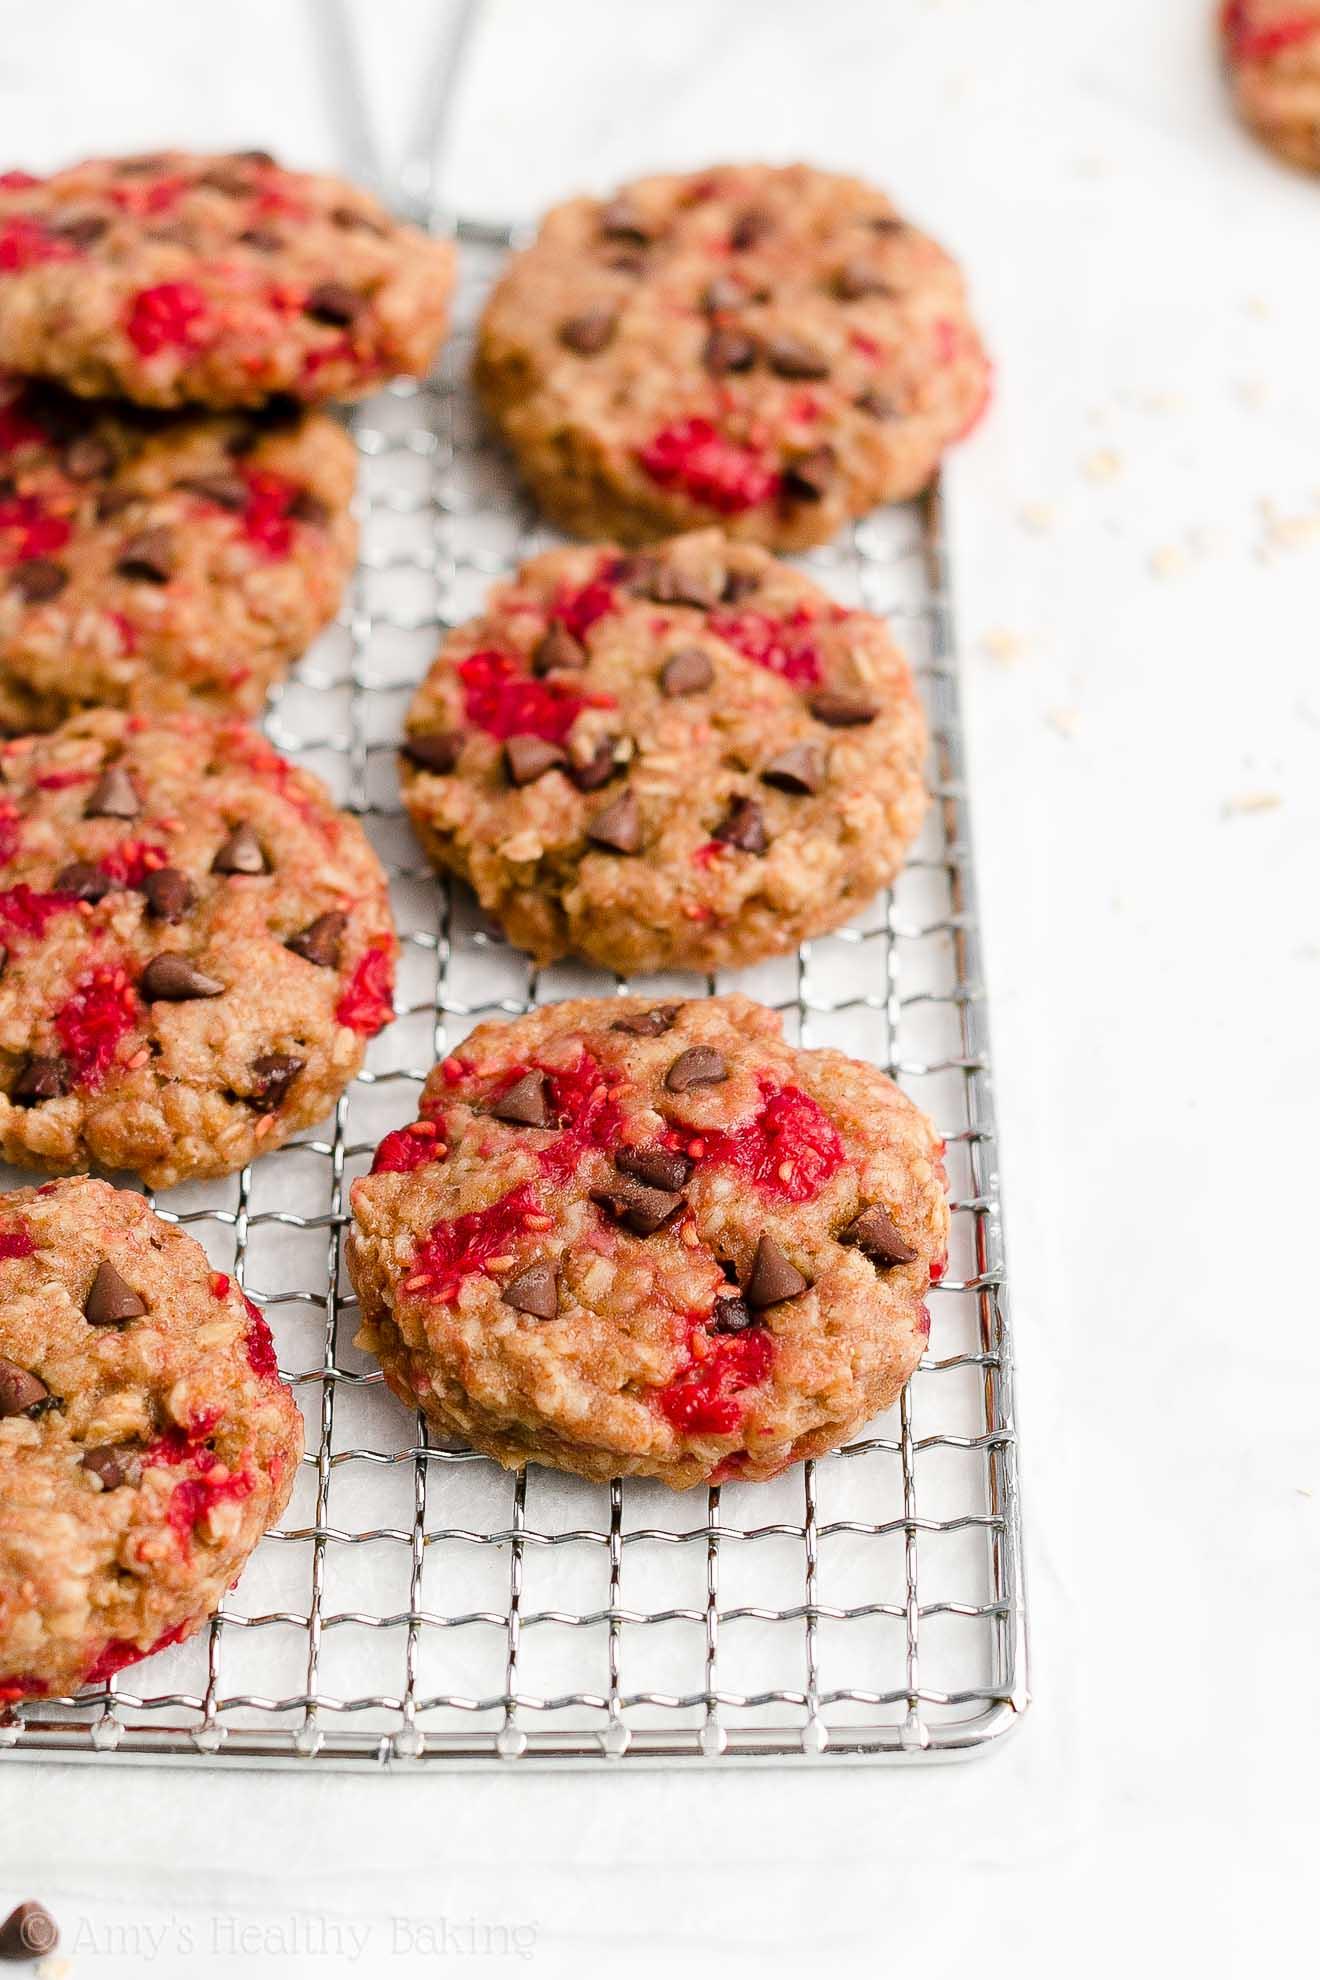 Easy Healthy Weight Watchers Raspberry Chocolate Chip Oatmeal Breakfast Cookies